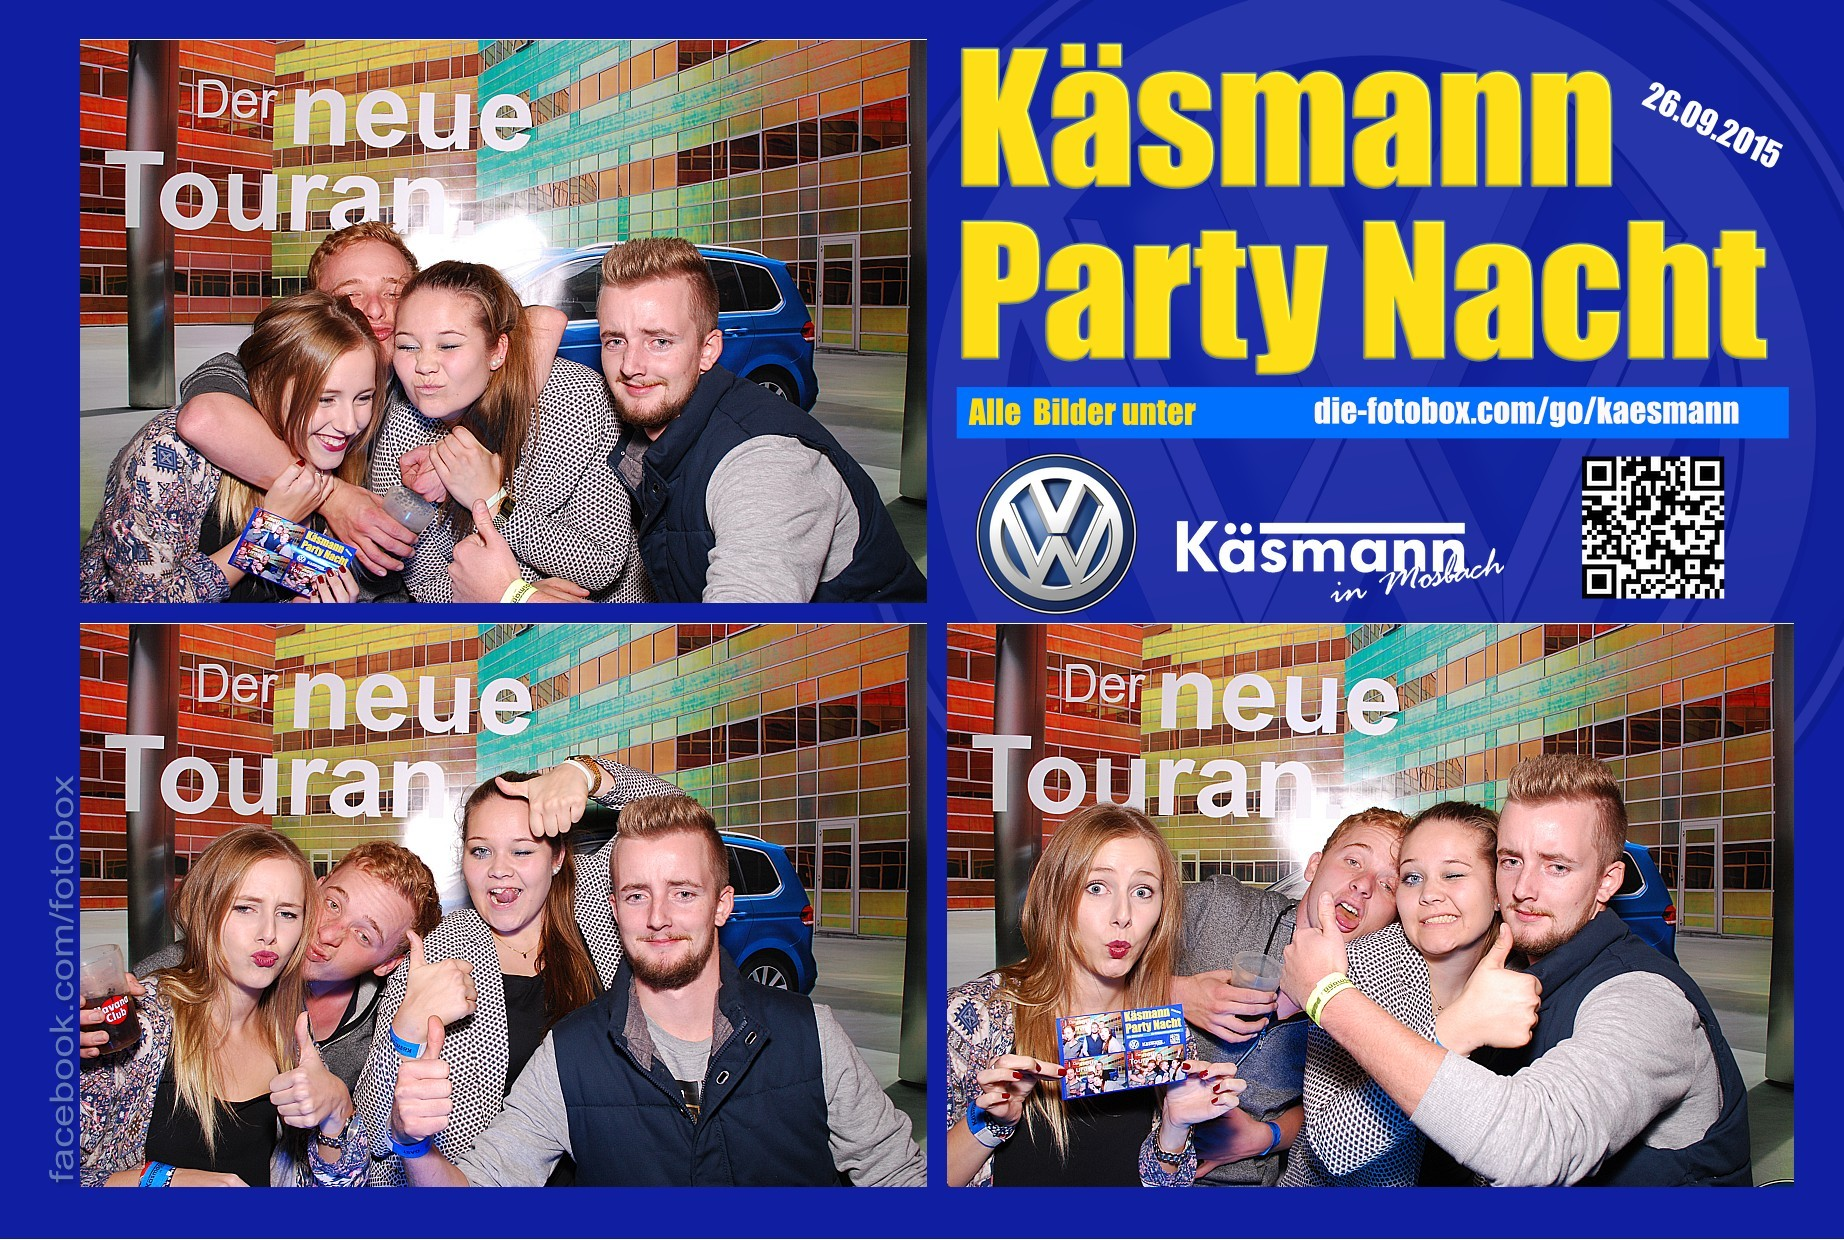 Käsmannparty 2015 - www.die-fotobox.com 01392